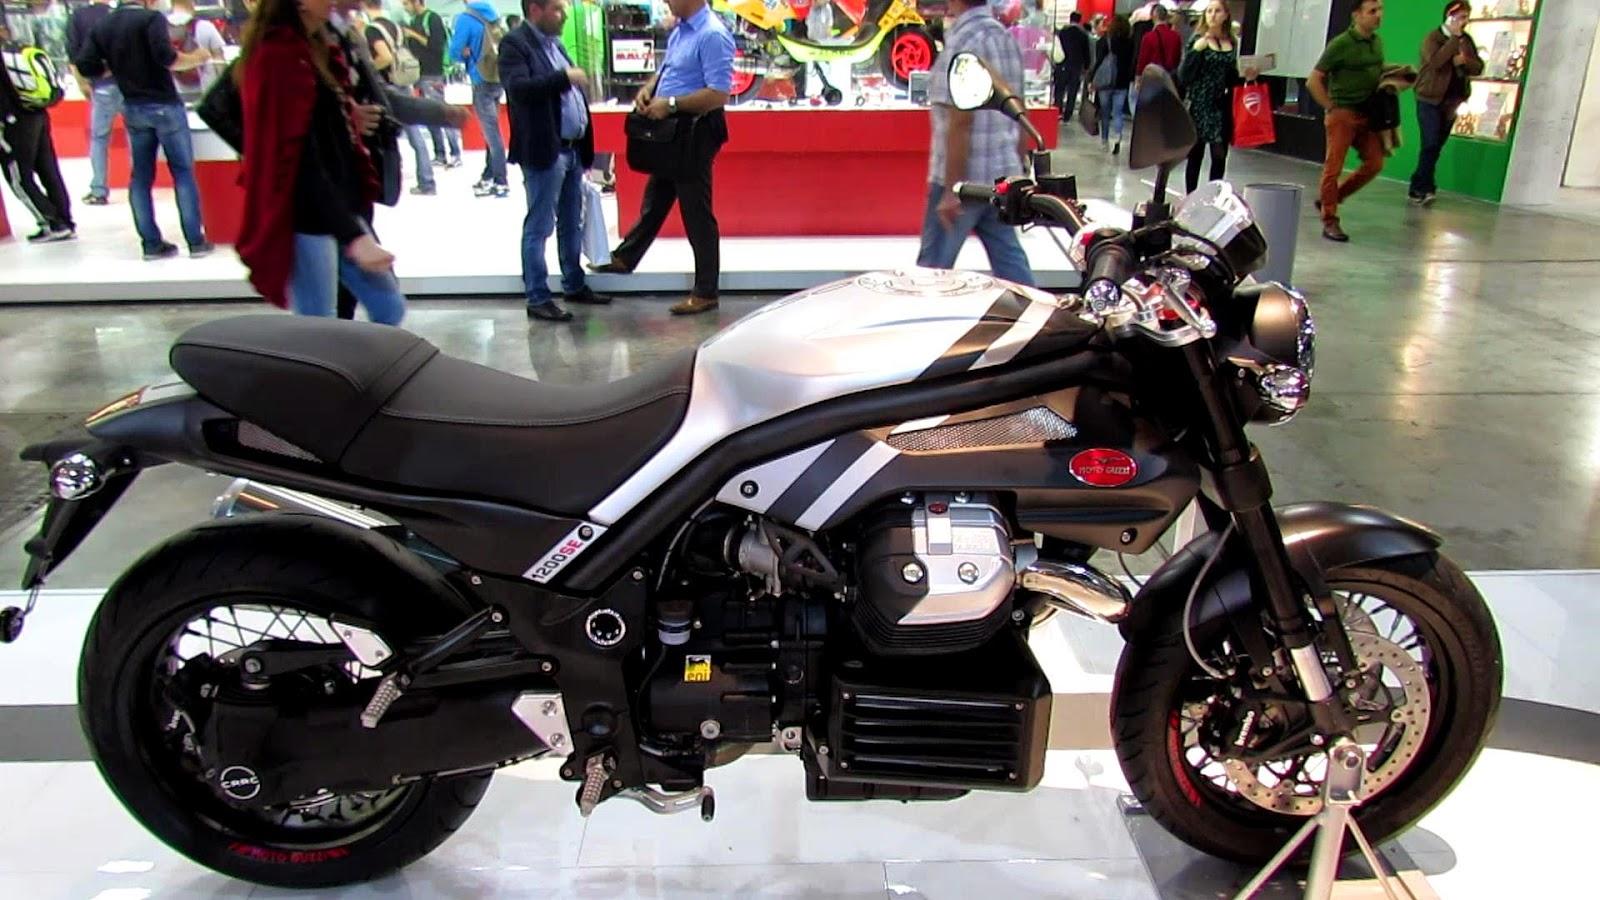 Moto Guzzi Griso 8V SE Motorcycles Price